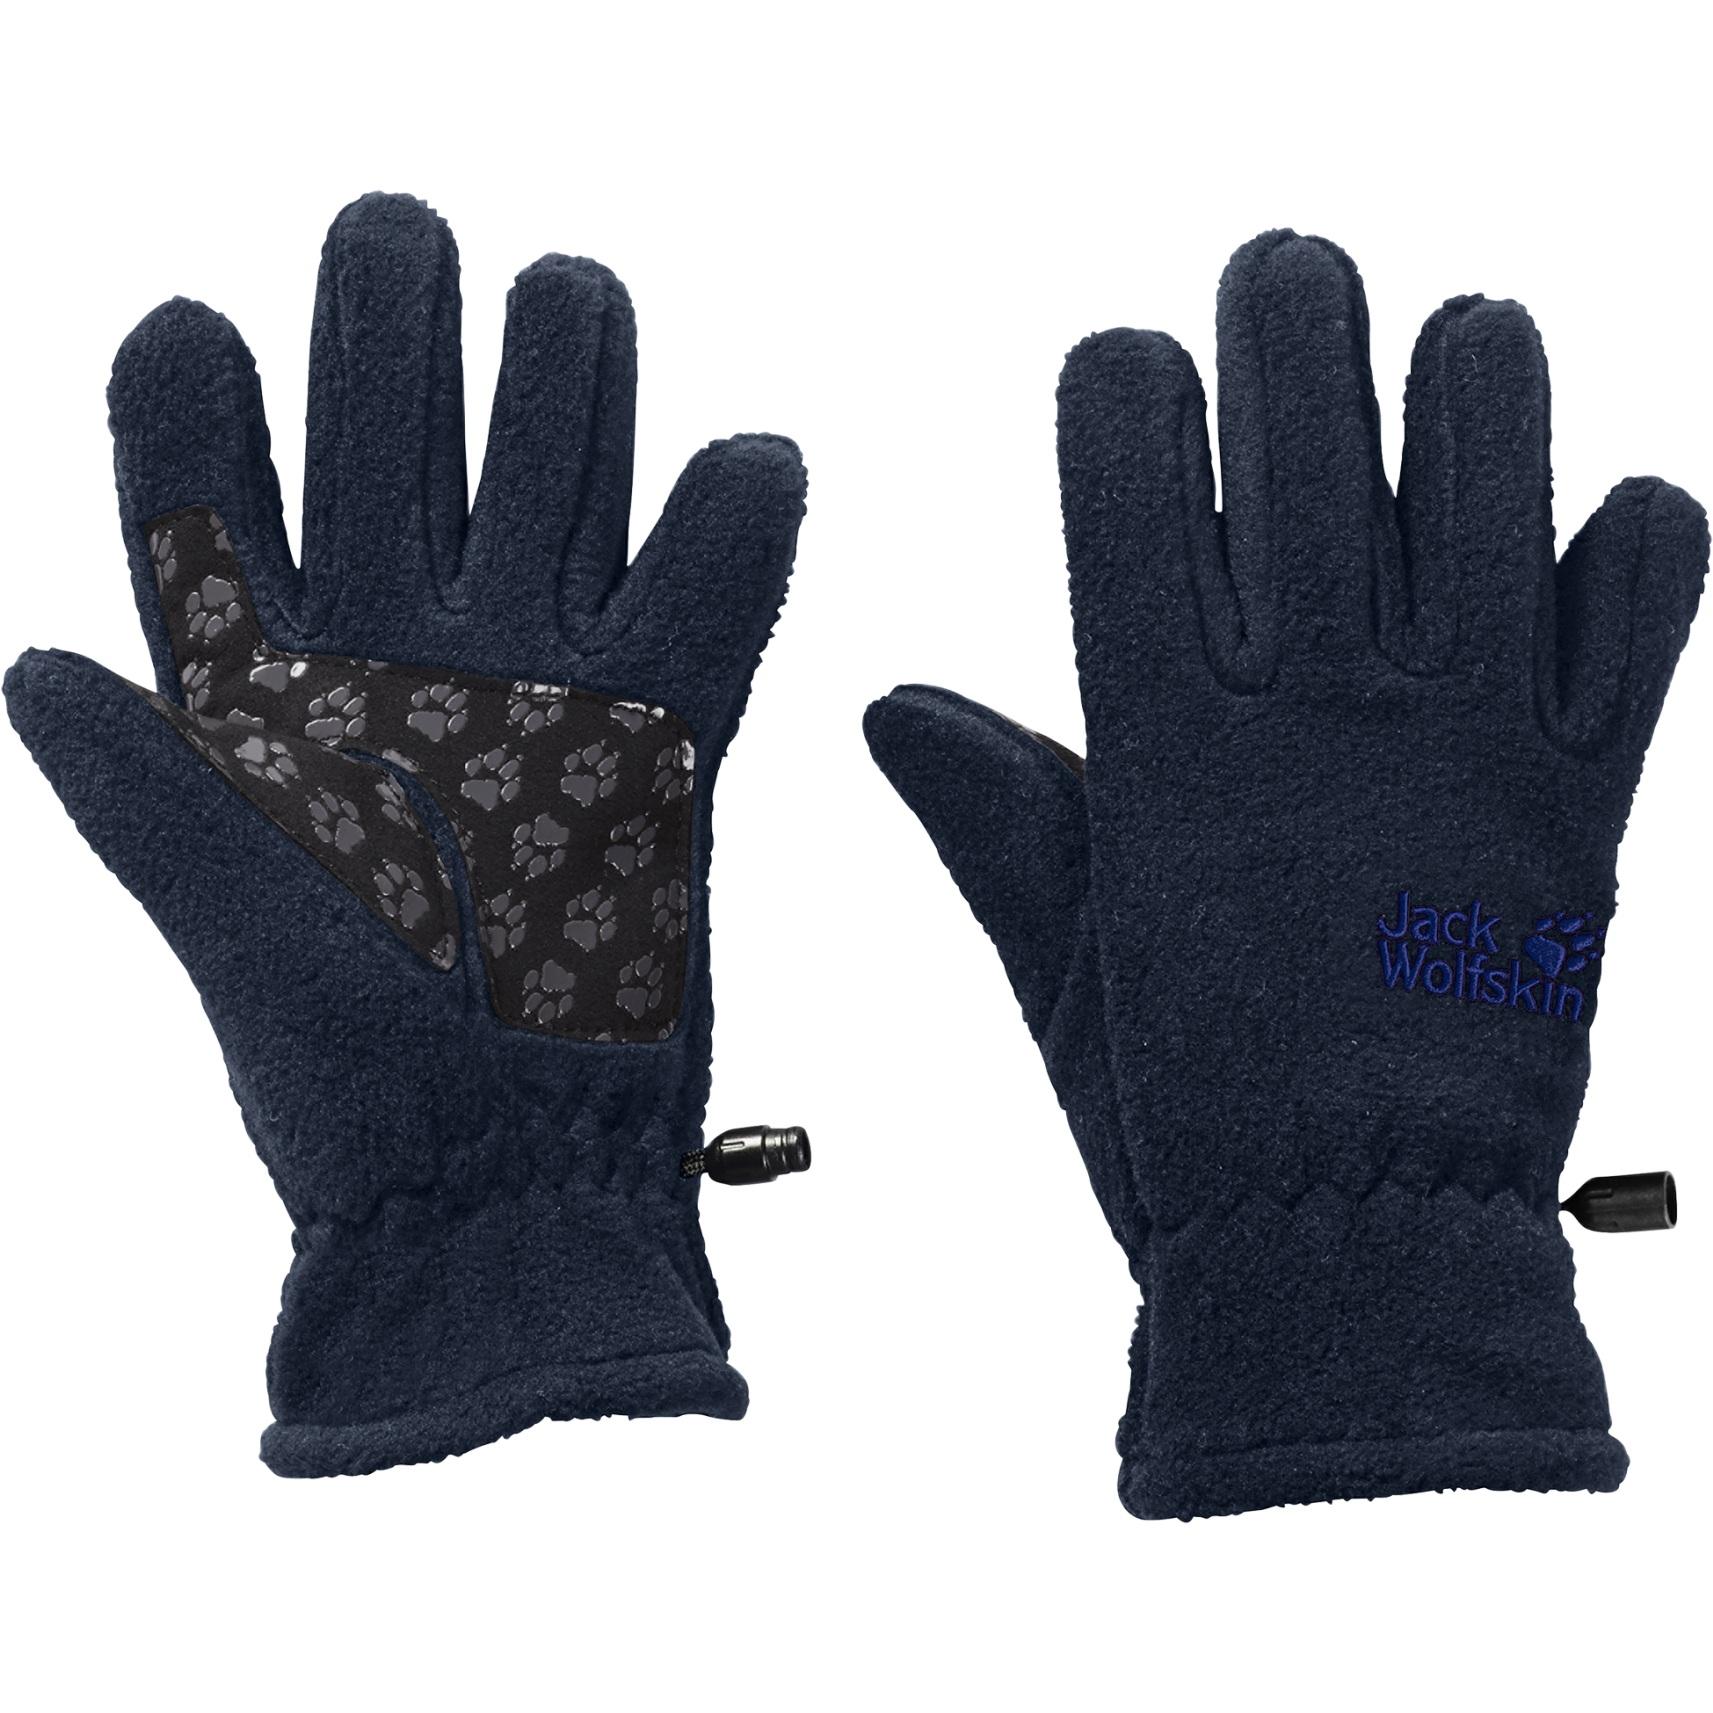 Jack Wolfskin Fleece Kinder Handschuhe - midnight blue